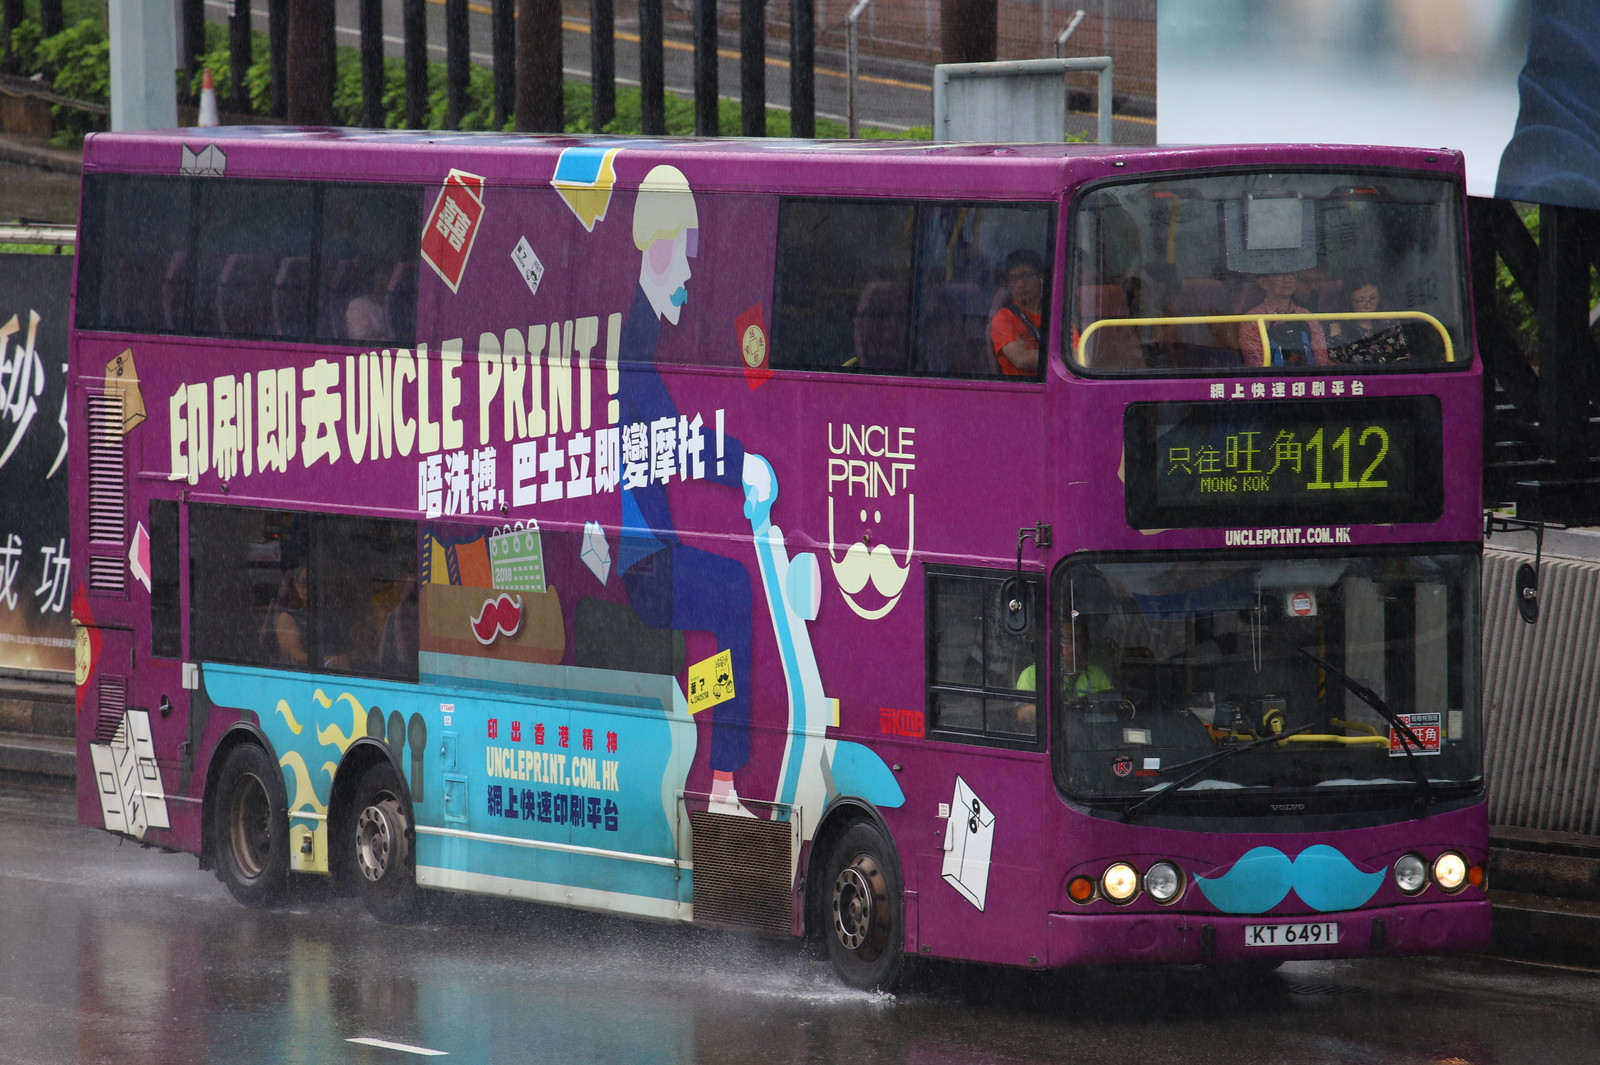 Kowloon Motor Bus (九巴) - Page 13 - SkyserCity on kowloon tong, manila bus route map, airport express, philadelphia bus route map, chai wan, frankfurt bus route map, rome bus route map, island line, stockholm bus route map, new york city bus route map, sham shui po, canada bus route map, orlando bus route map, causeway bay, mong kok, luxembourg bus route map, north point, athens bus route map, tsim sha tsui, lima bus route map, tsing yi, tsuen wan, jinan bus route map, sheung wan, wellington bus route map, abu dhabi bus route map, hong kong station, xian bus route map, tseung kwan o, singapore bus route map, zhuhai bus route map, osaka bus route map, qingdao bus route map, yau ma tei, guangzhou bus route map,